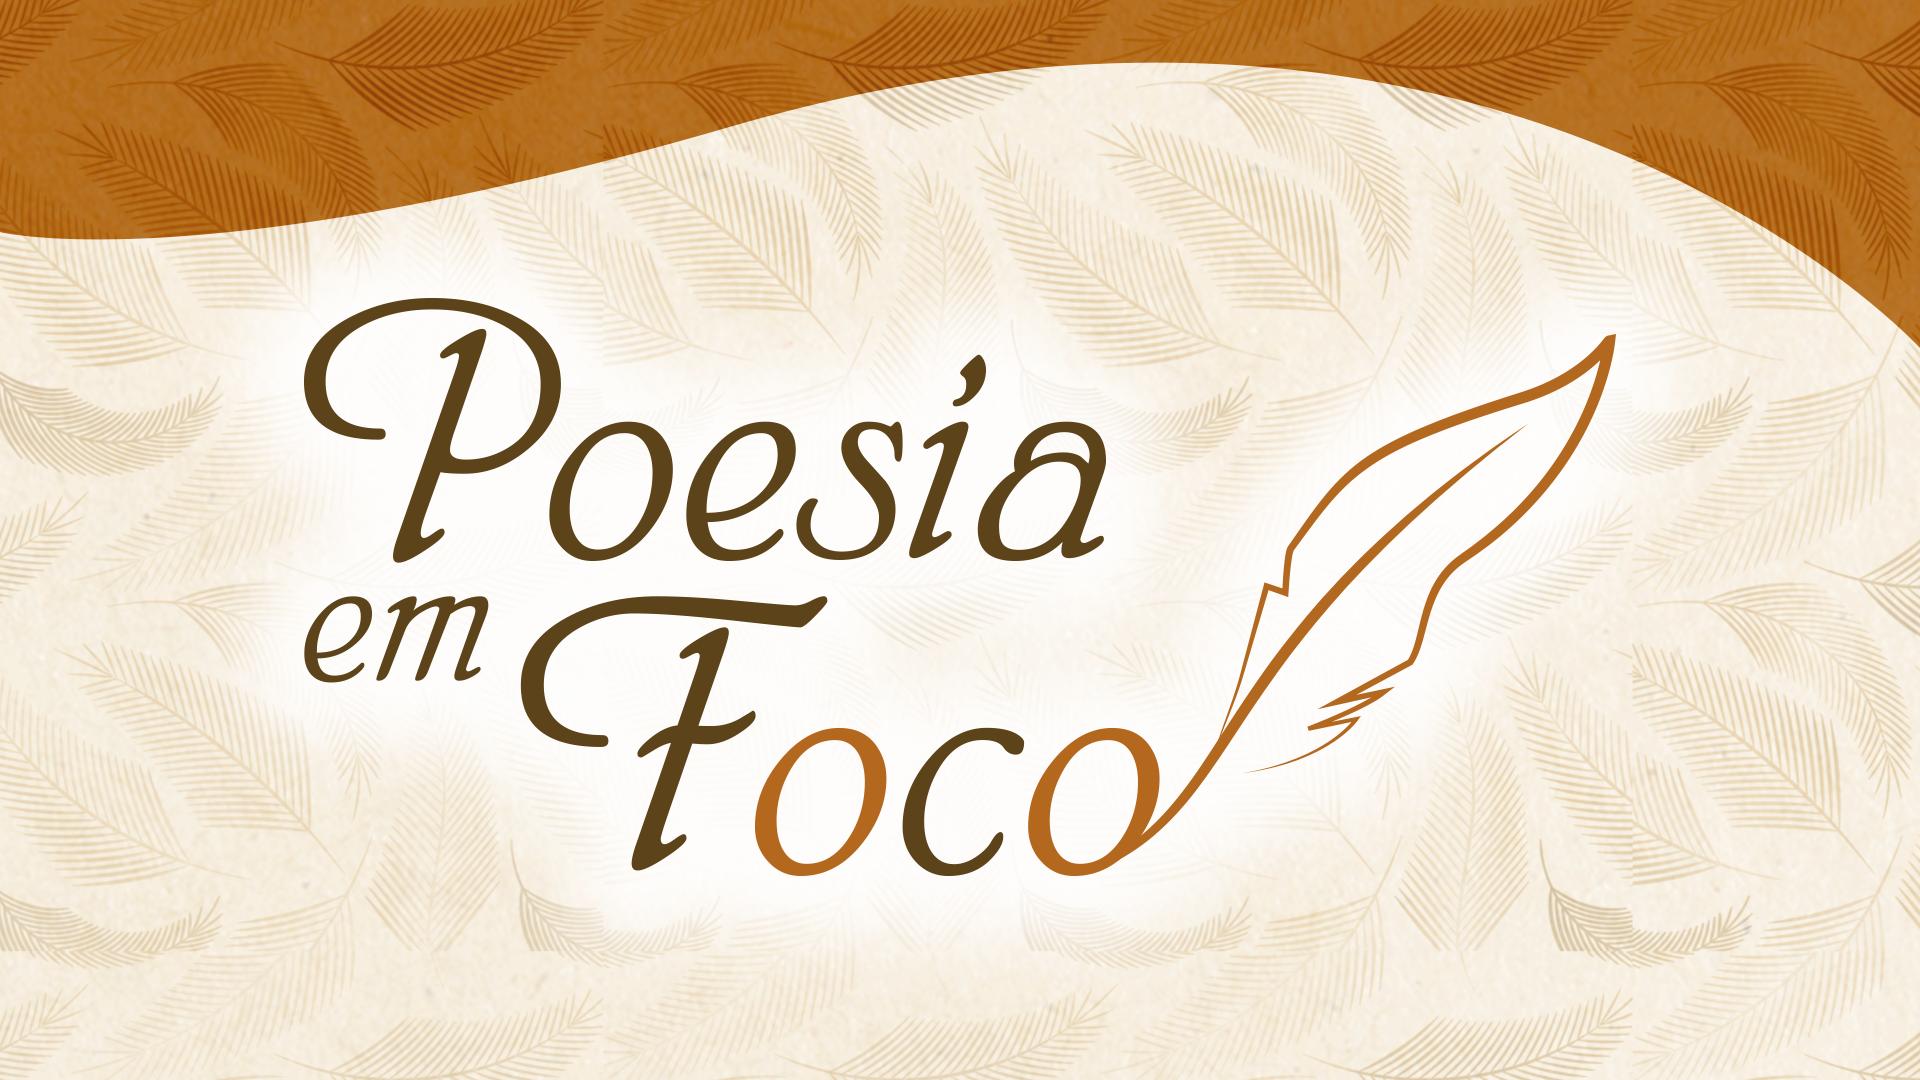 Curso Etapa lança série de vídeos para estudo de poesia